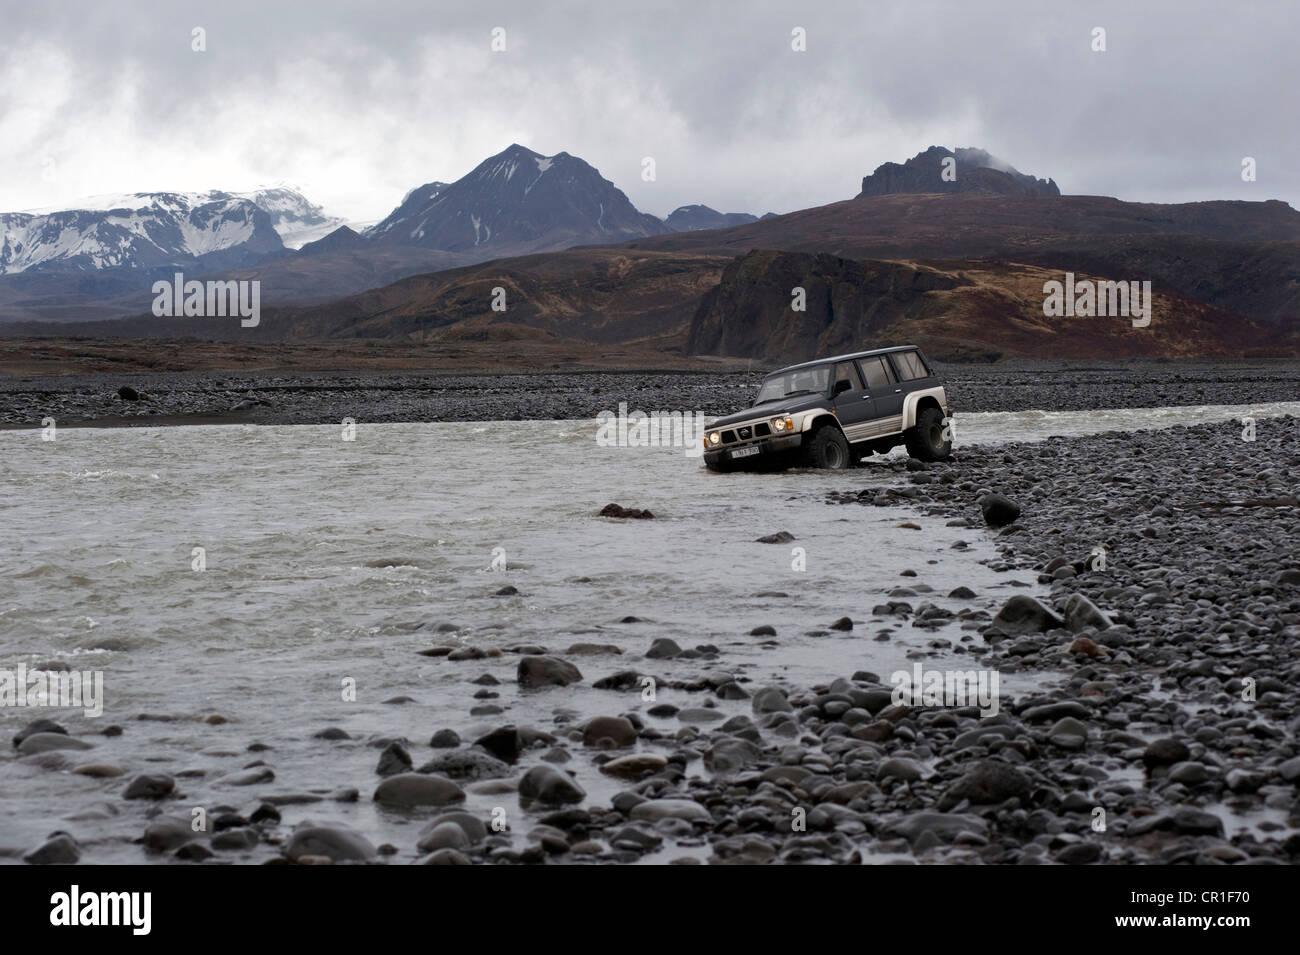 Super Jeep fording the river Markarfljót, Þórsmoerk, Iceland, Europe - Stock Image